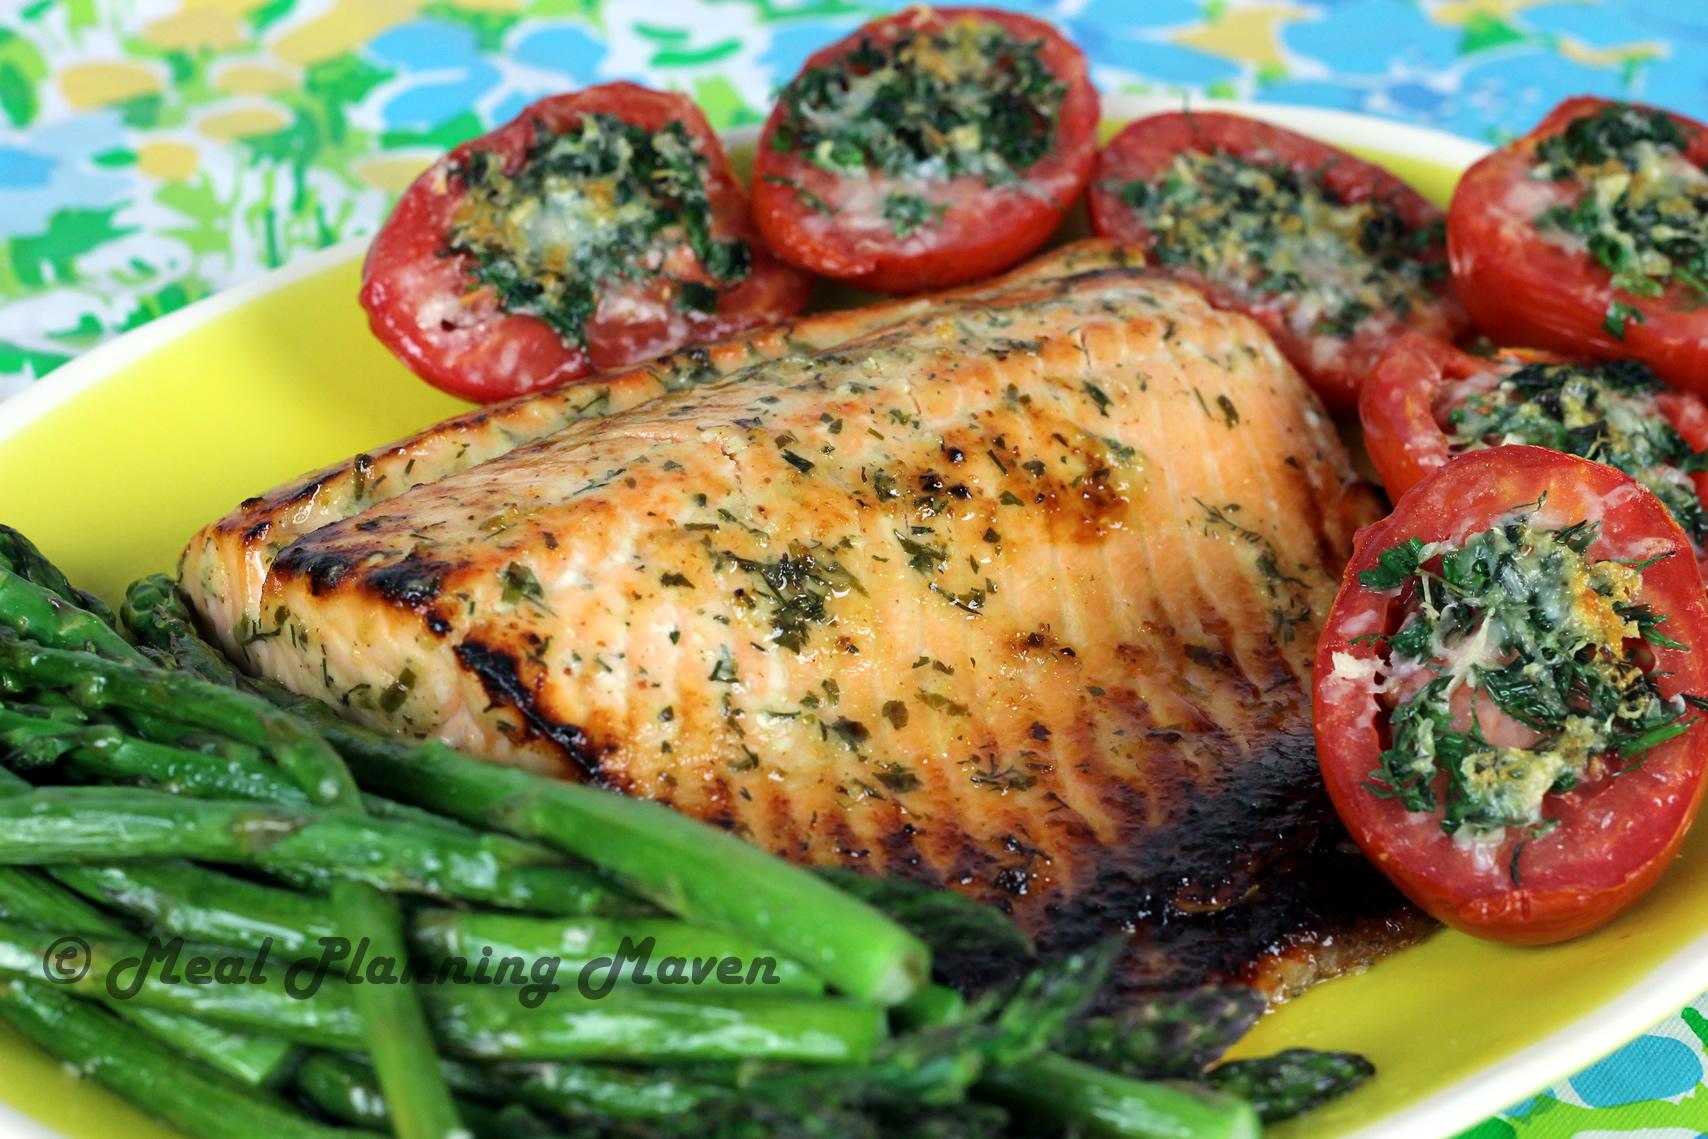 Roasted Honey-Dijon Salmon with Fresh Herbs